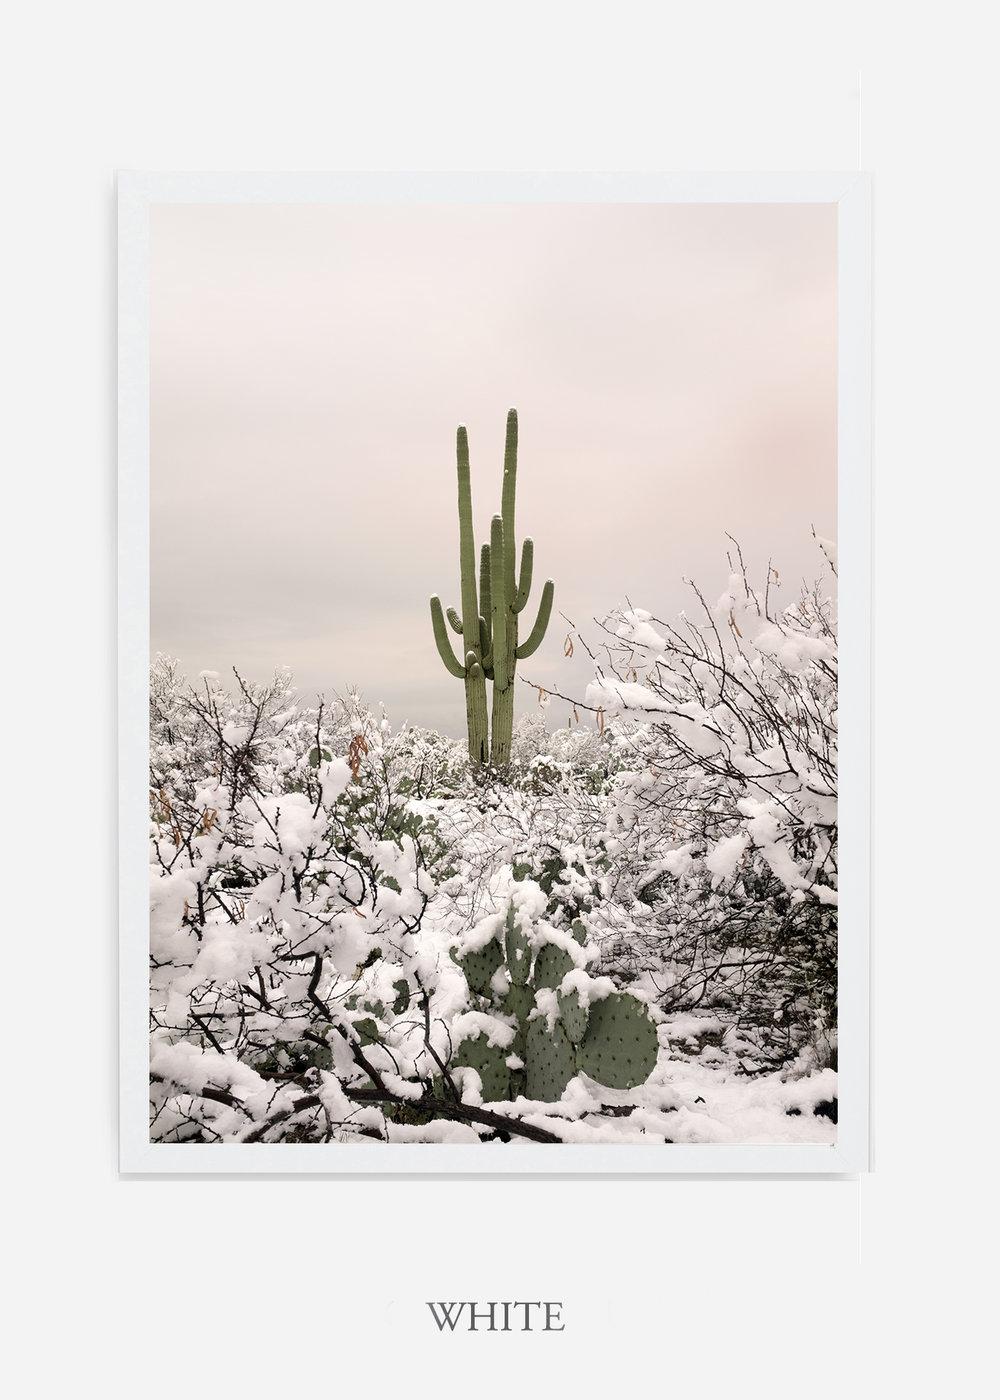 nomat-whiteframe-saguaroNo.2-wildercalifornia-art-wallart-cactusprint-homedecor-prints-arizona-botanical-artwork-interiordesign.jpg